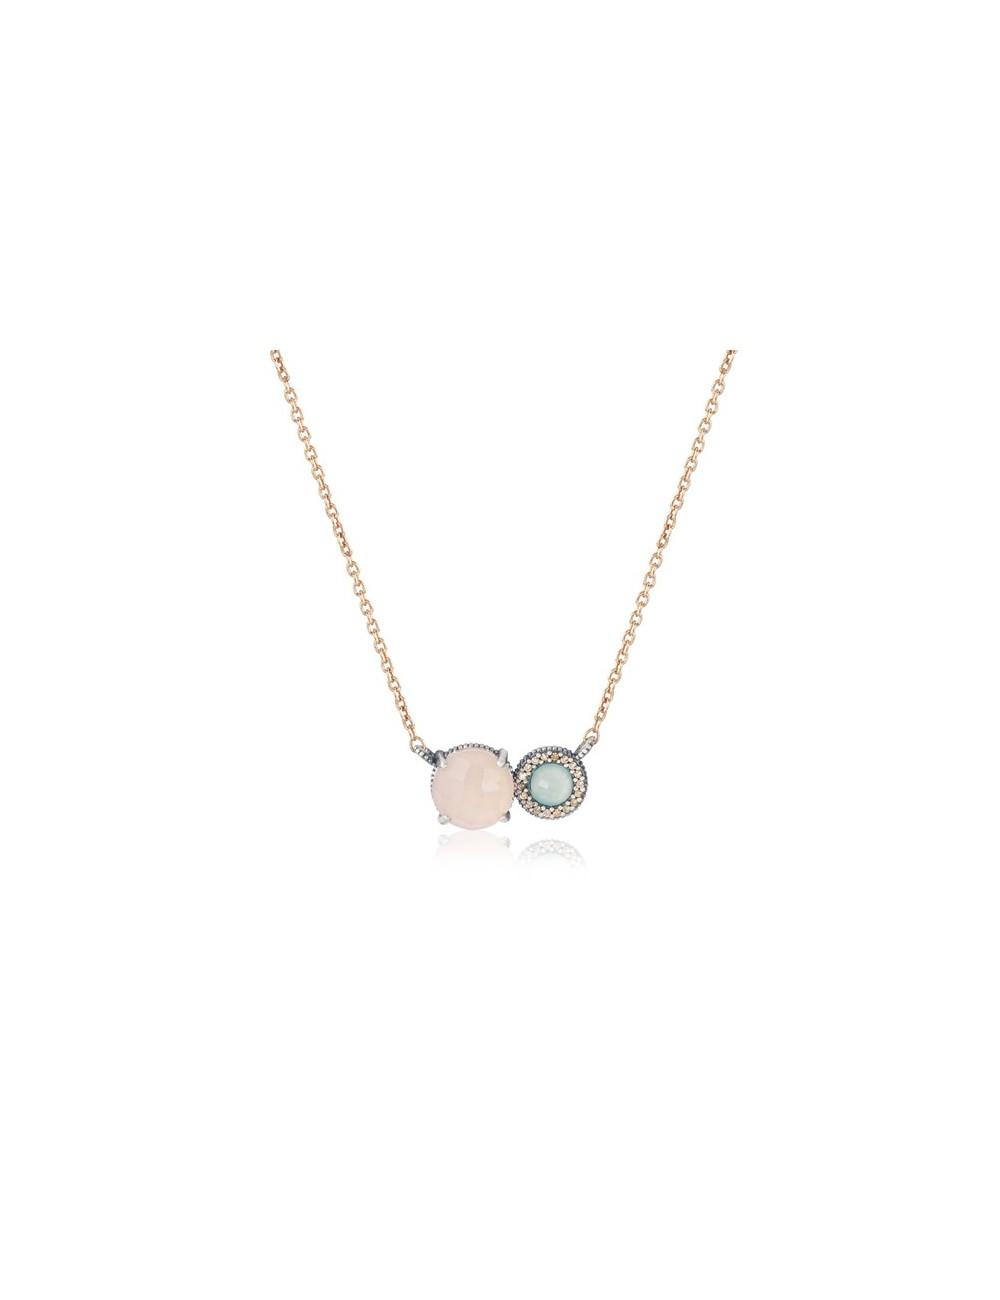 Sunfield -Collar Sunfield plata, cuarzo rosa, calcedonia y circonitas -CL062504